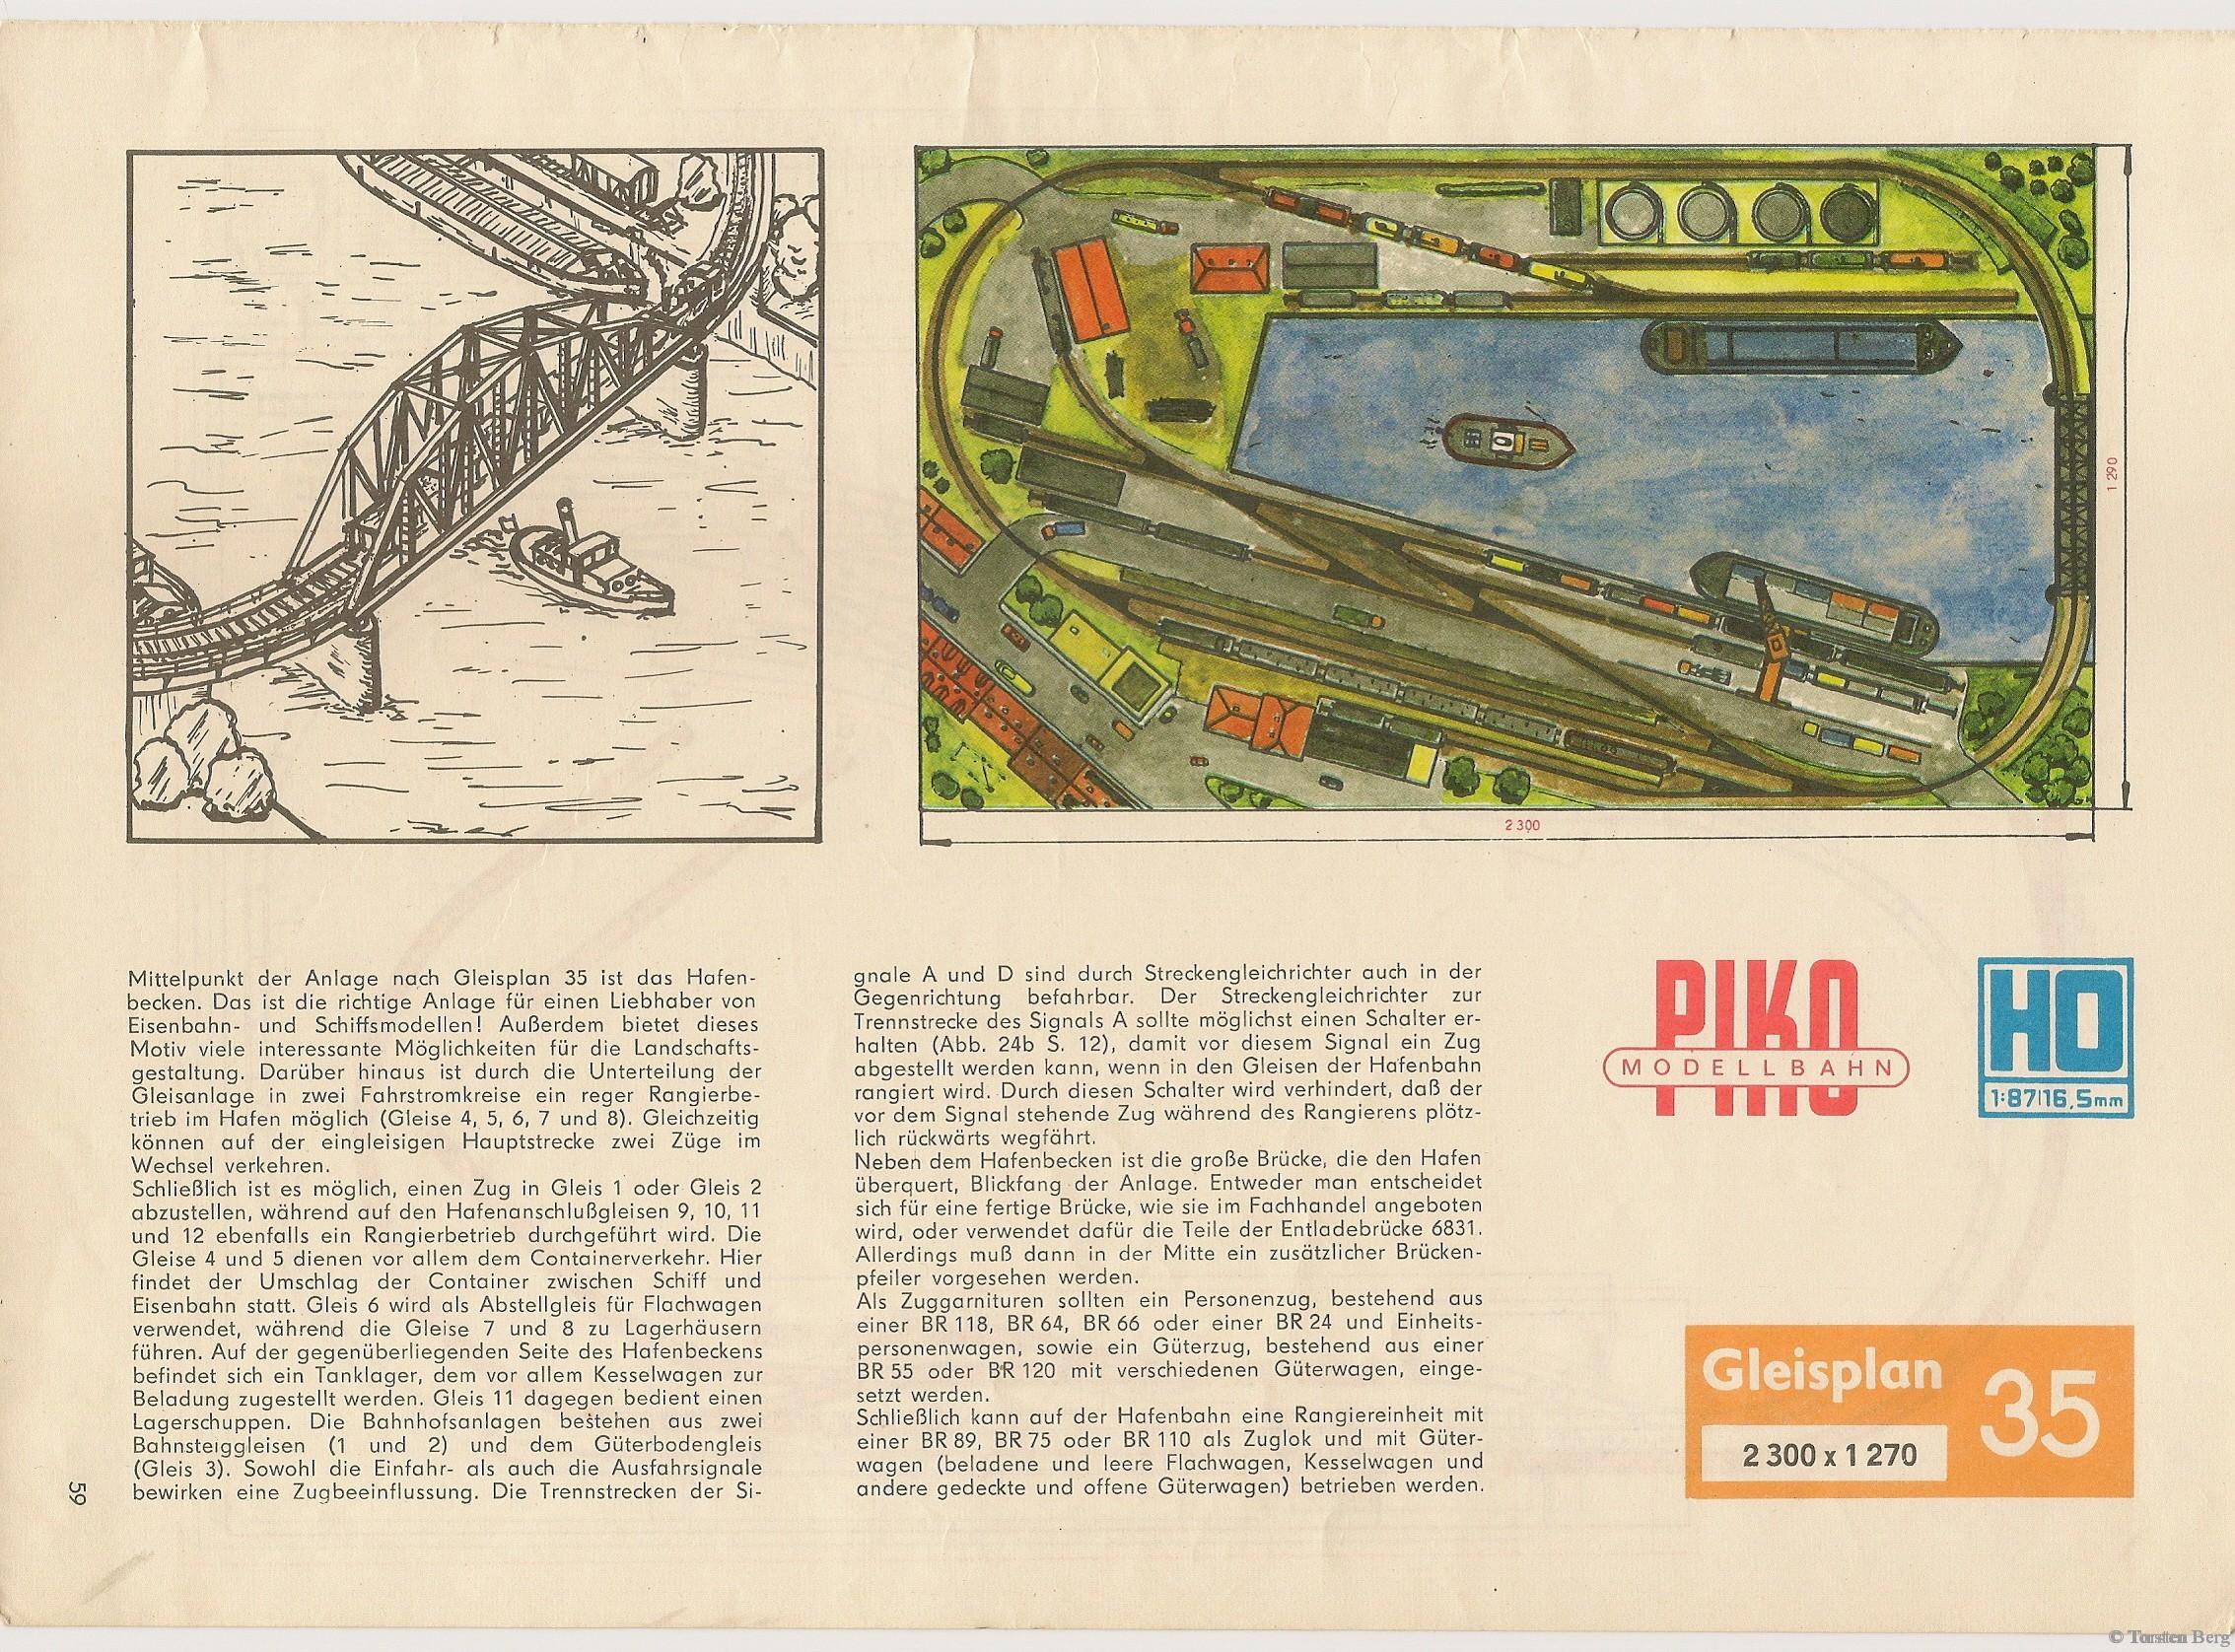 60 VEB Kombinat PIKO Standardgleis-Gleisplan 35